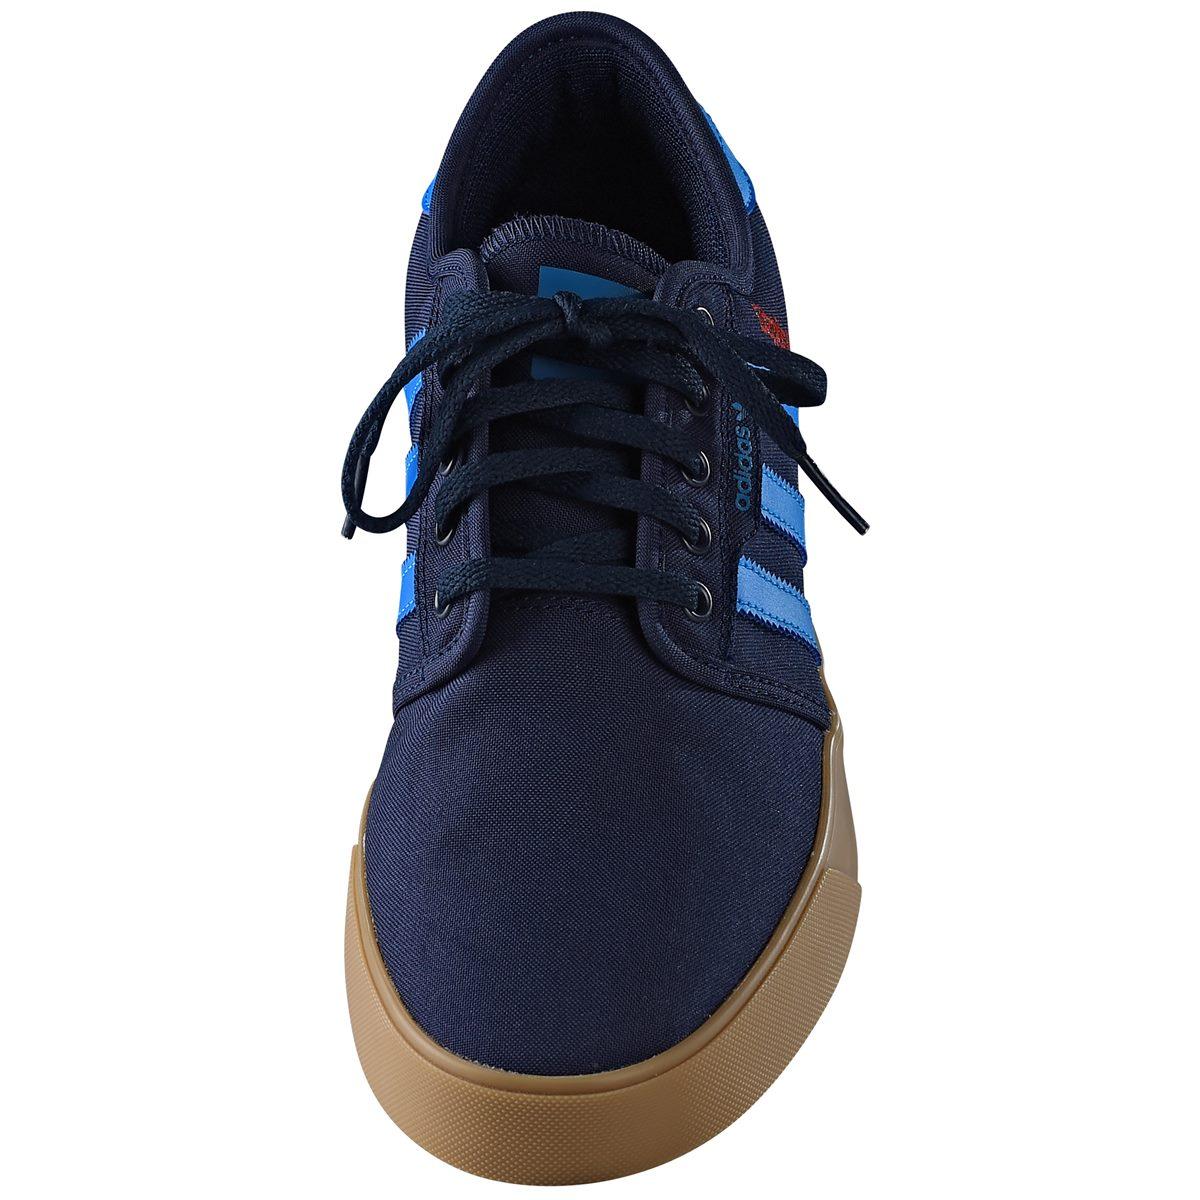 Troy Lee Designs Schuhe Team TLD X Adidas Navy